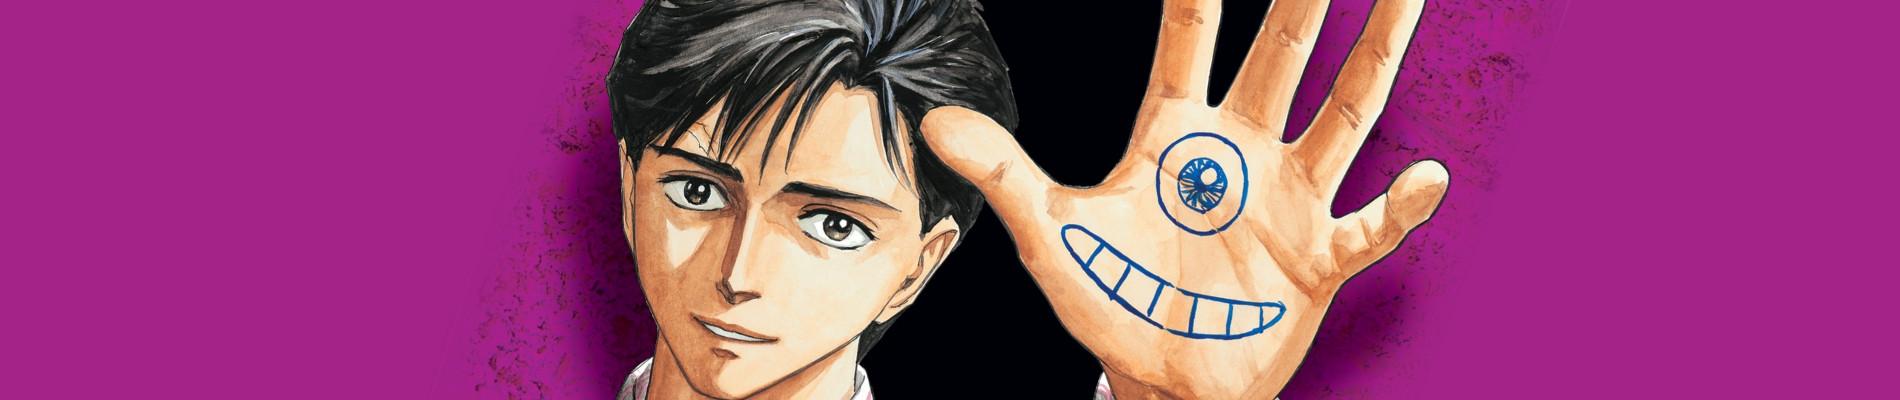 Read Manga Kiseijuu - Parasyte - 寄生獣 - All Anime Site